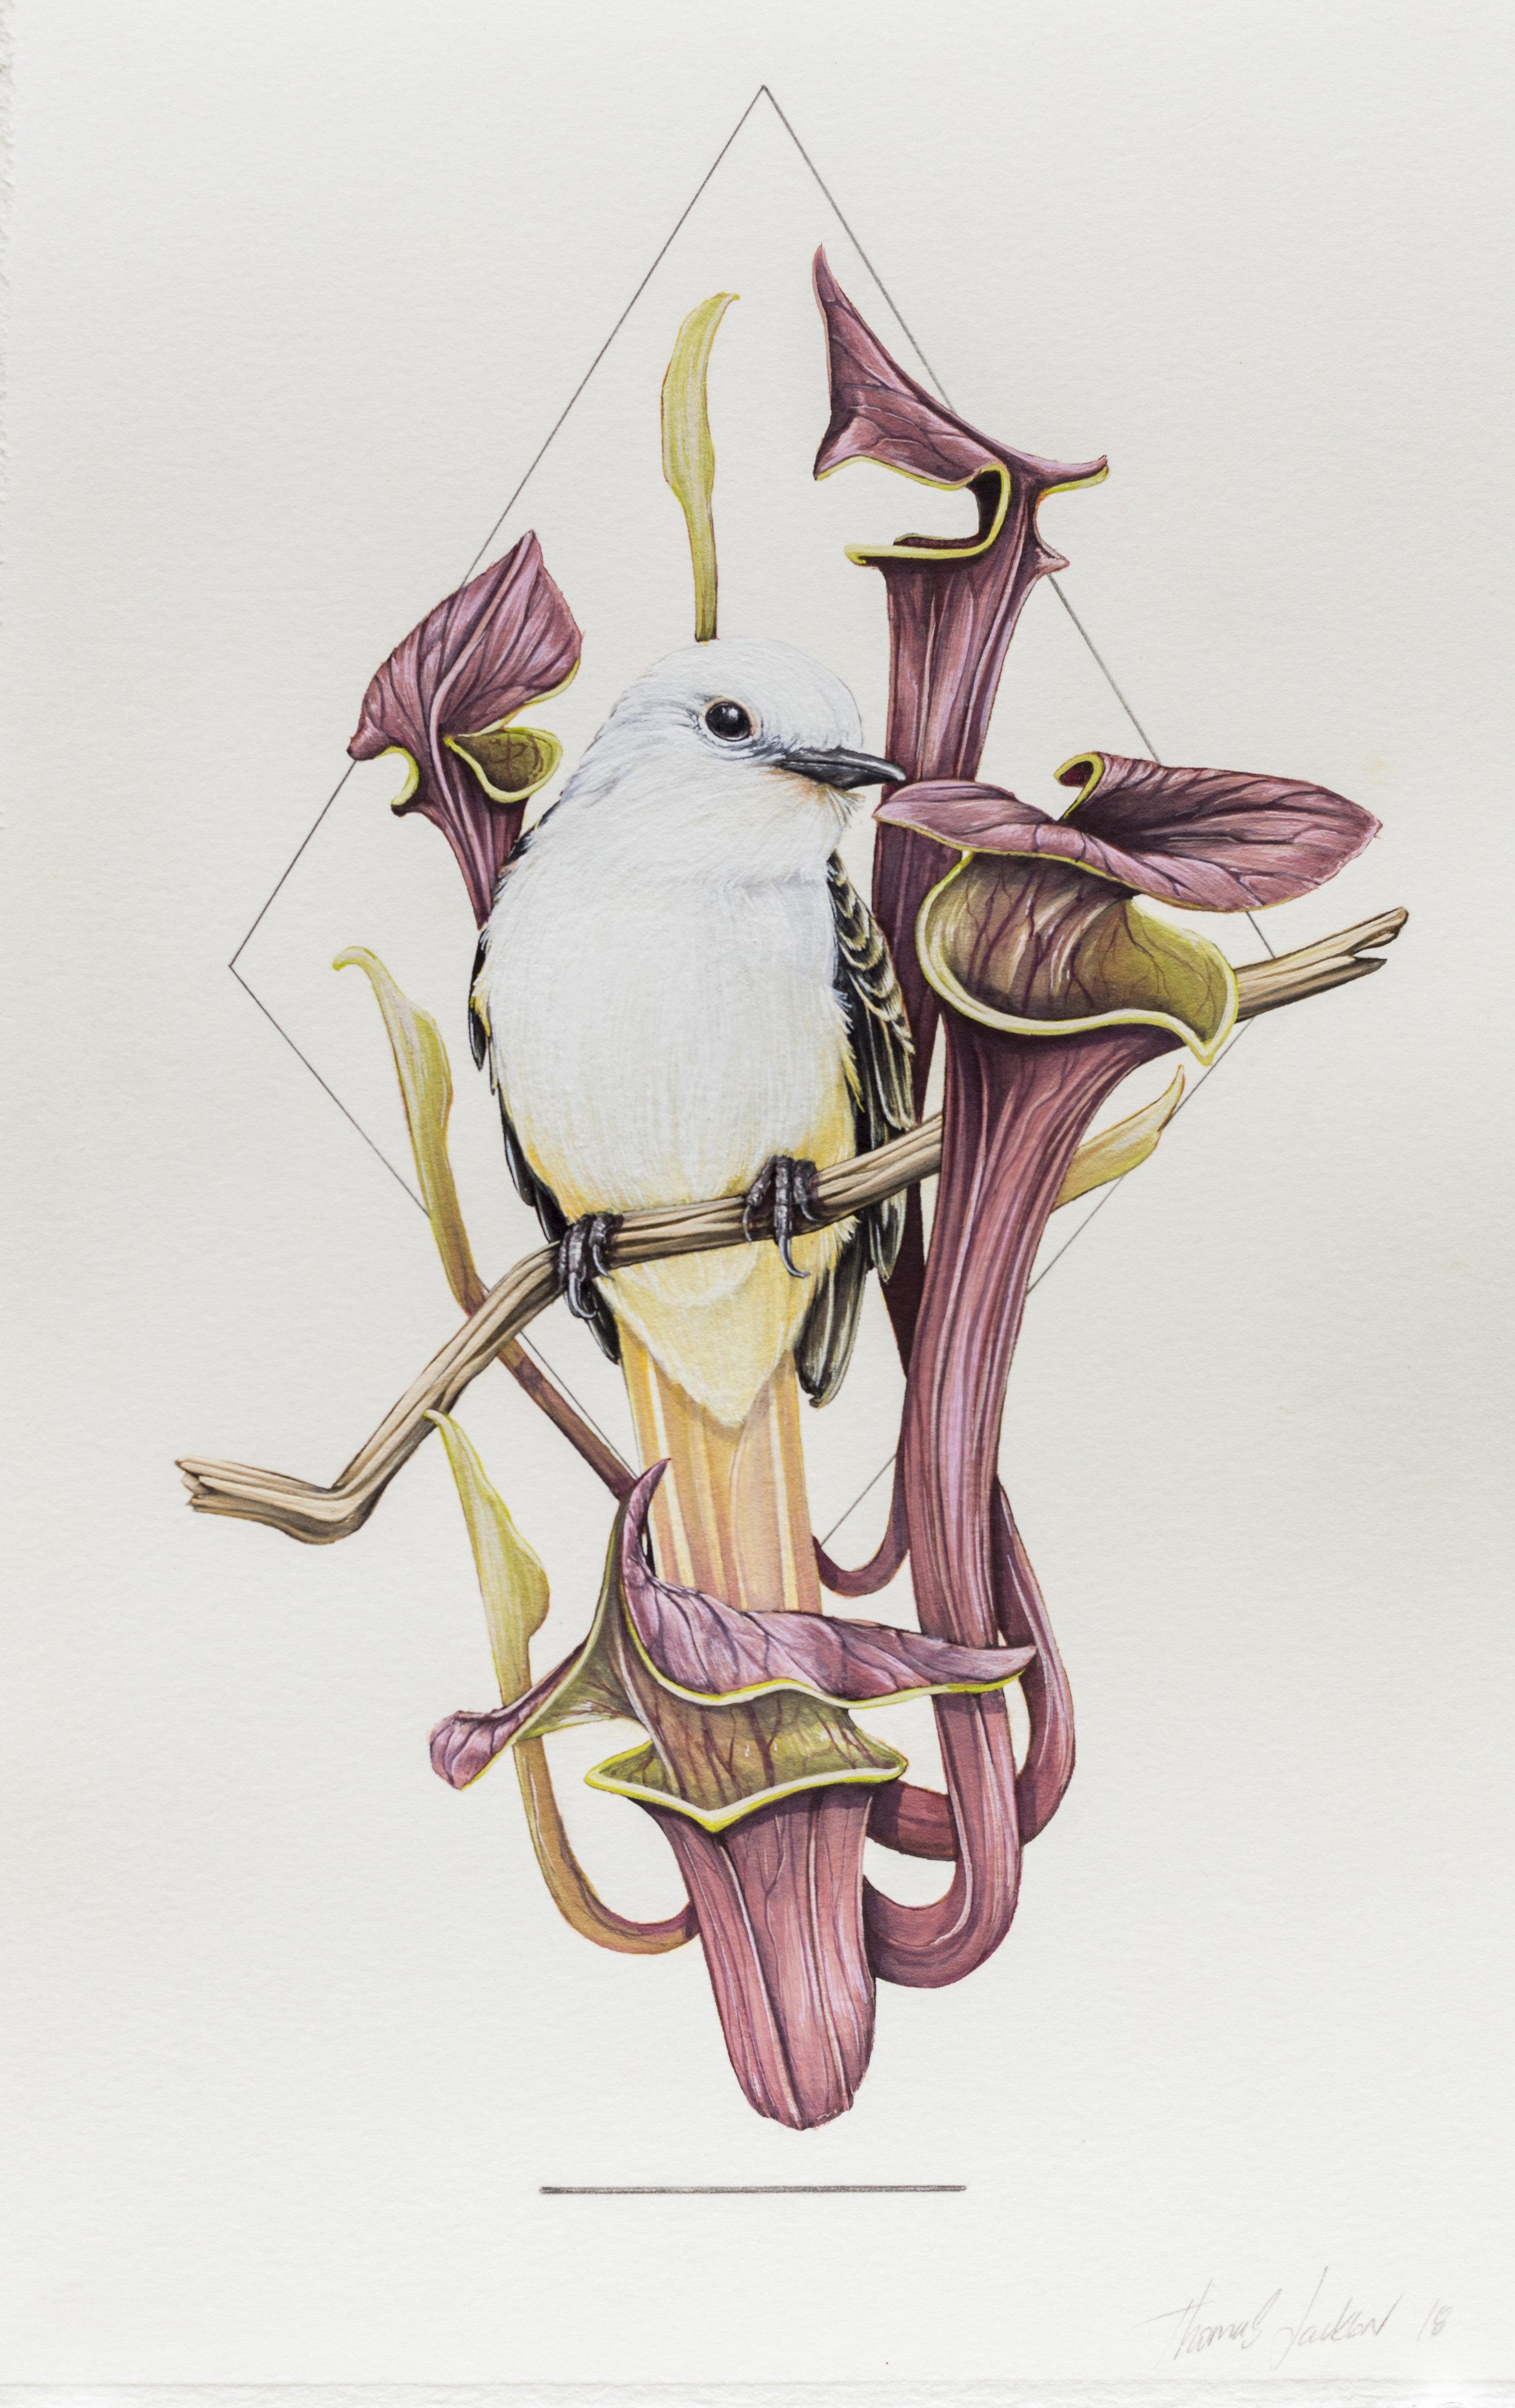 'Pitcher Plant'